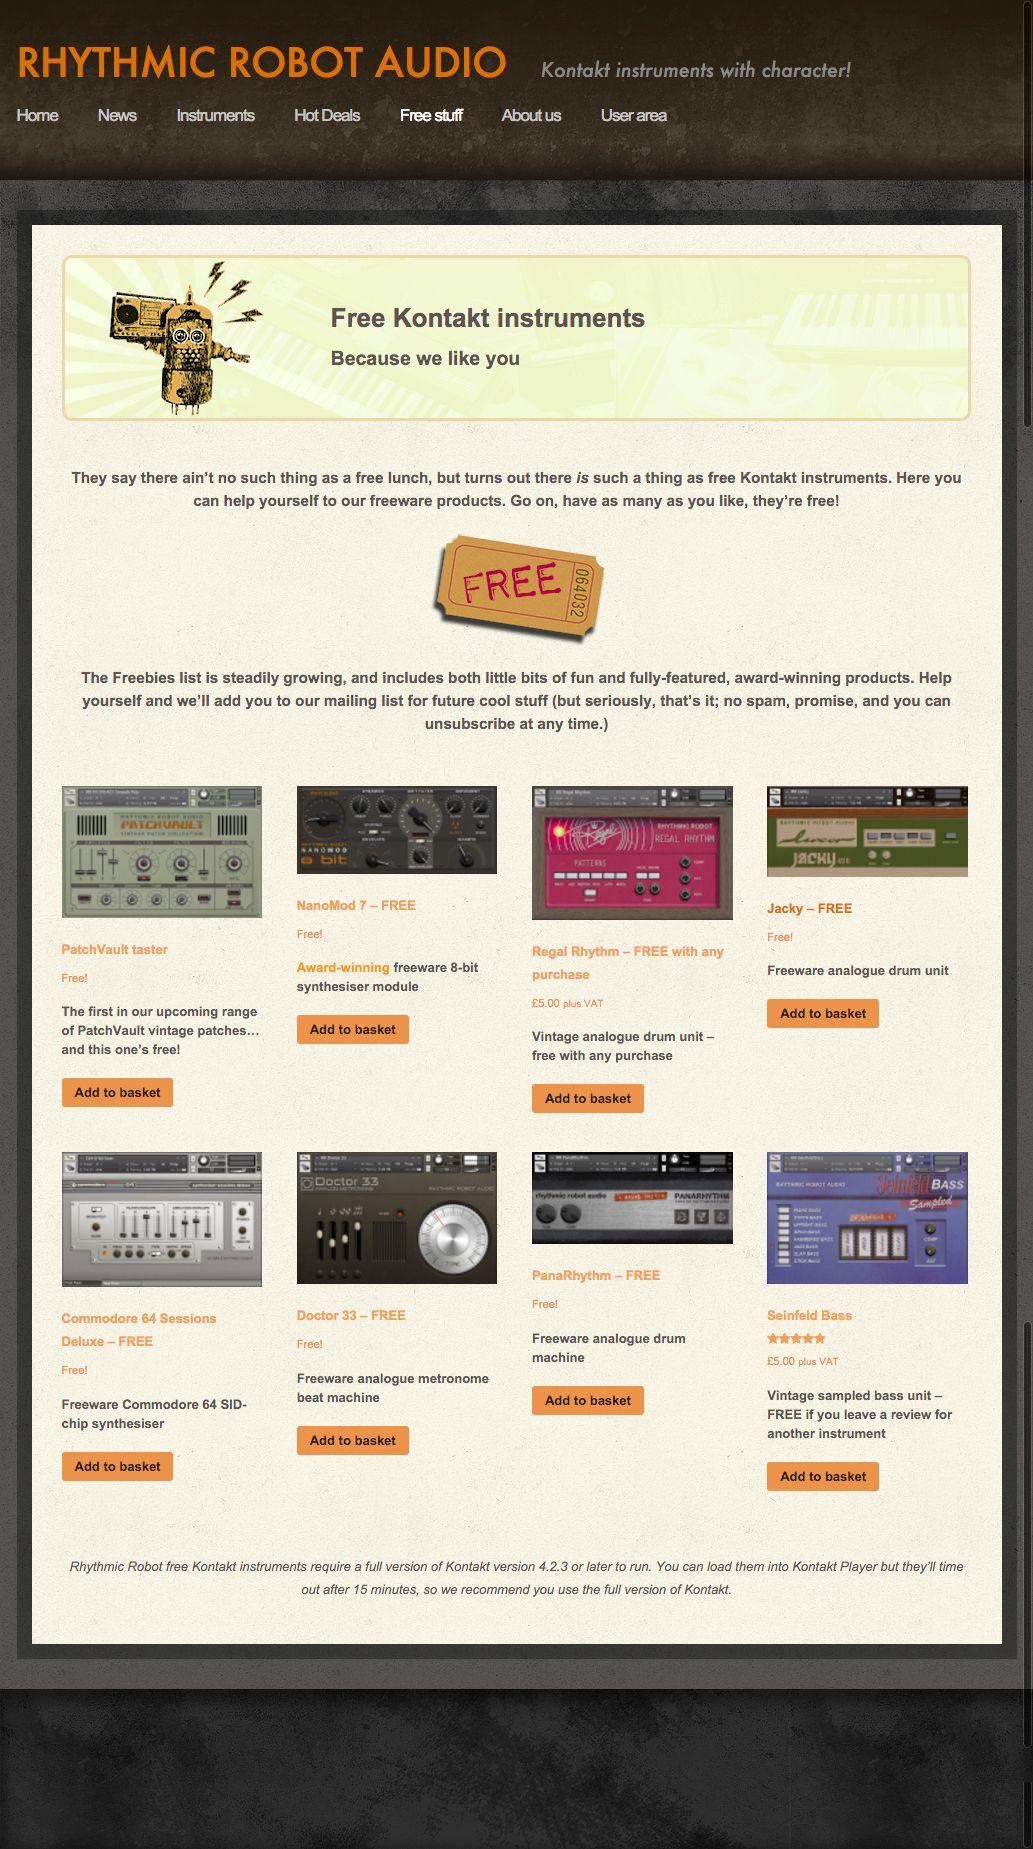 free kontakt instruments from rhythmic robot audio gear music technology instruments drum. Black Bedroom Furniture Sets. Home Design Ideas